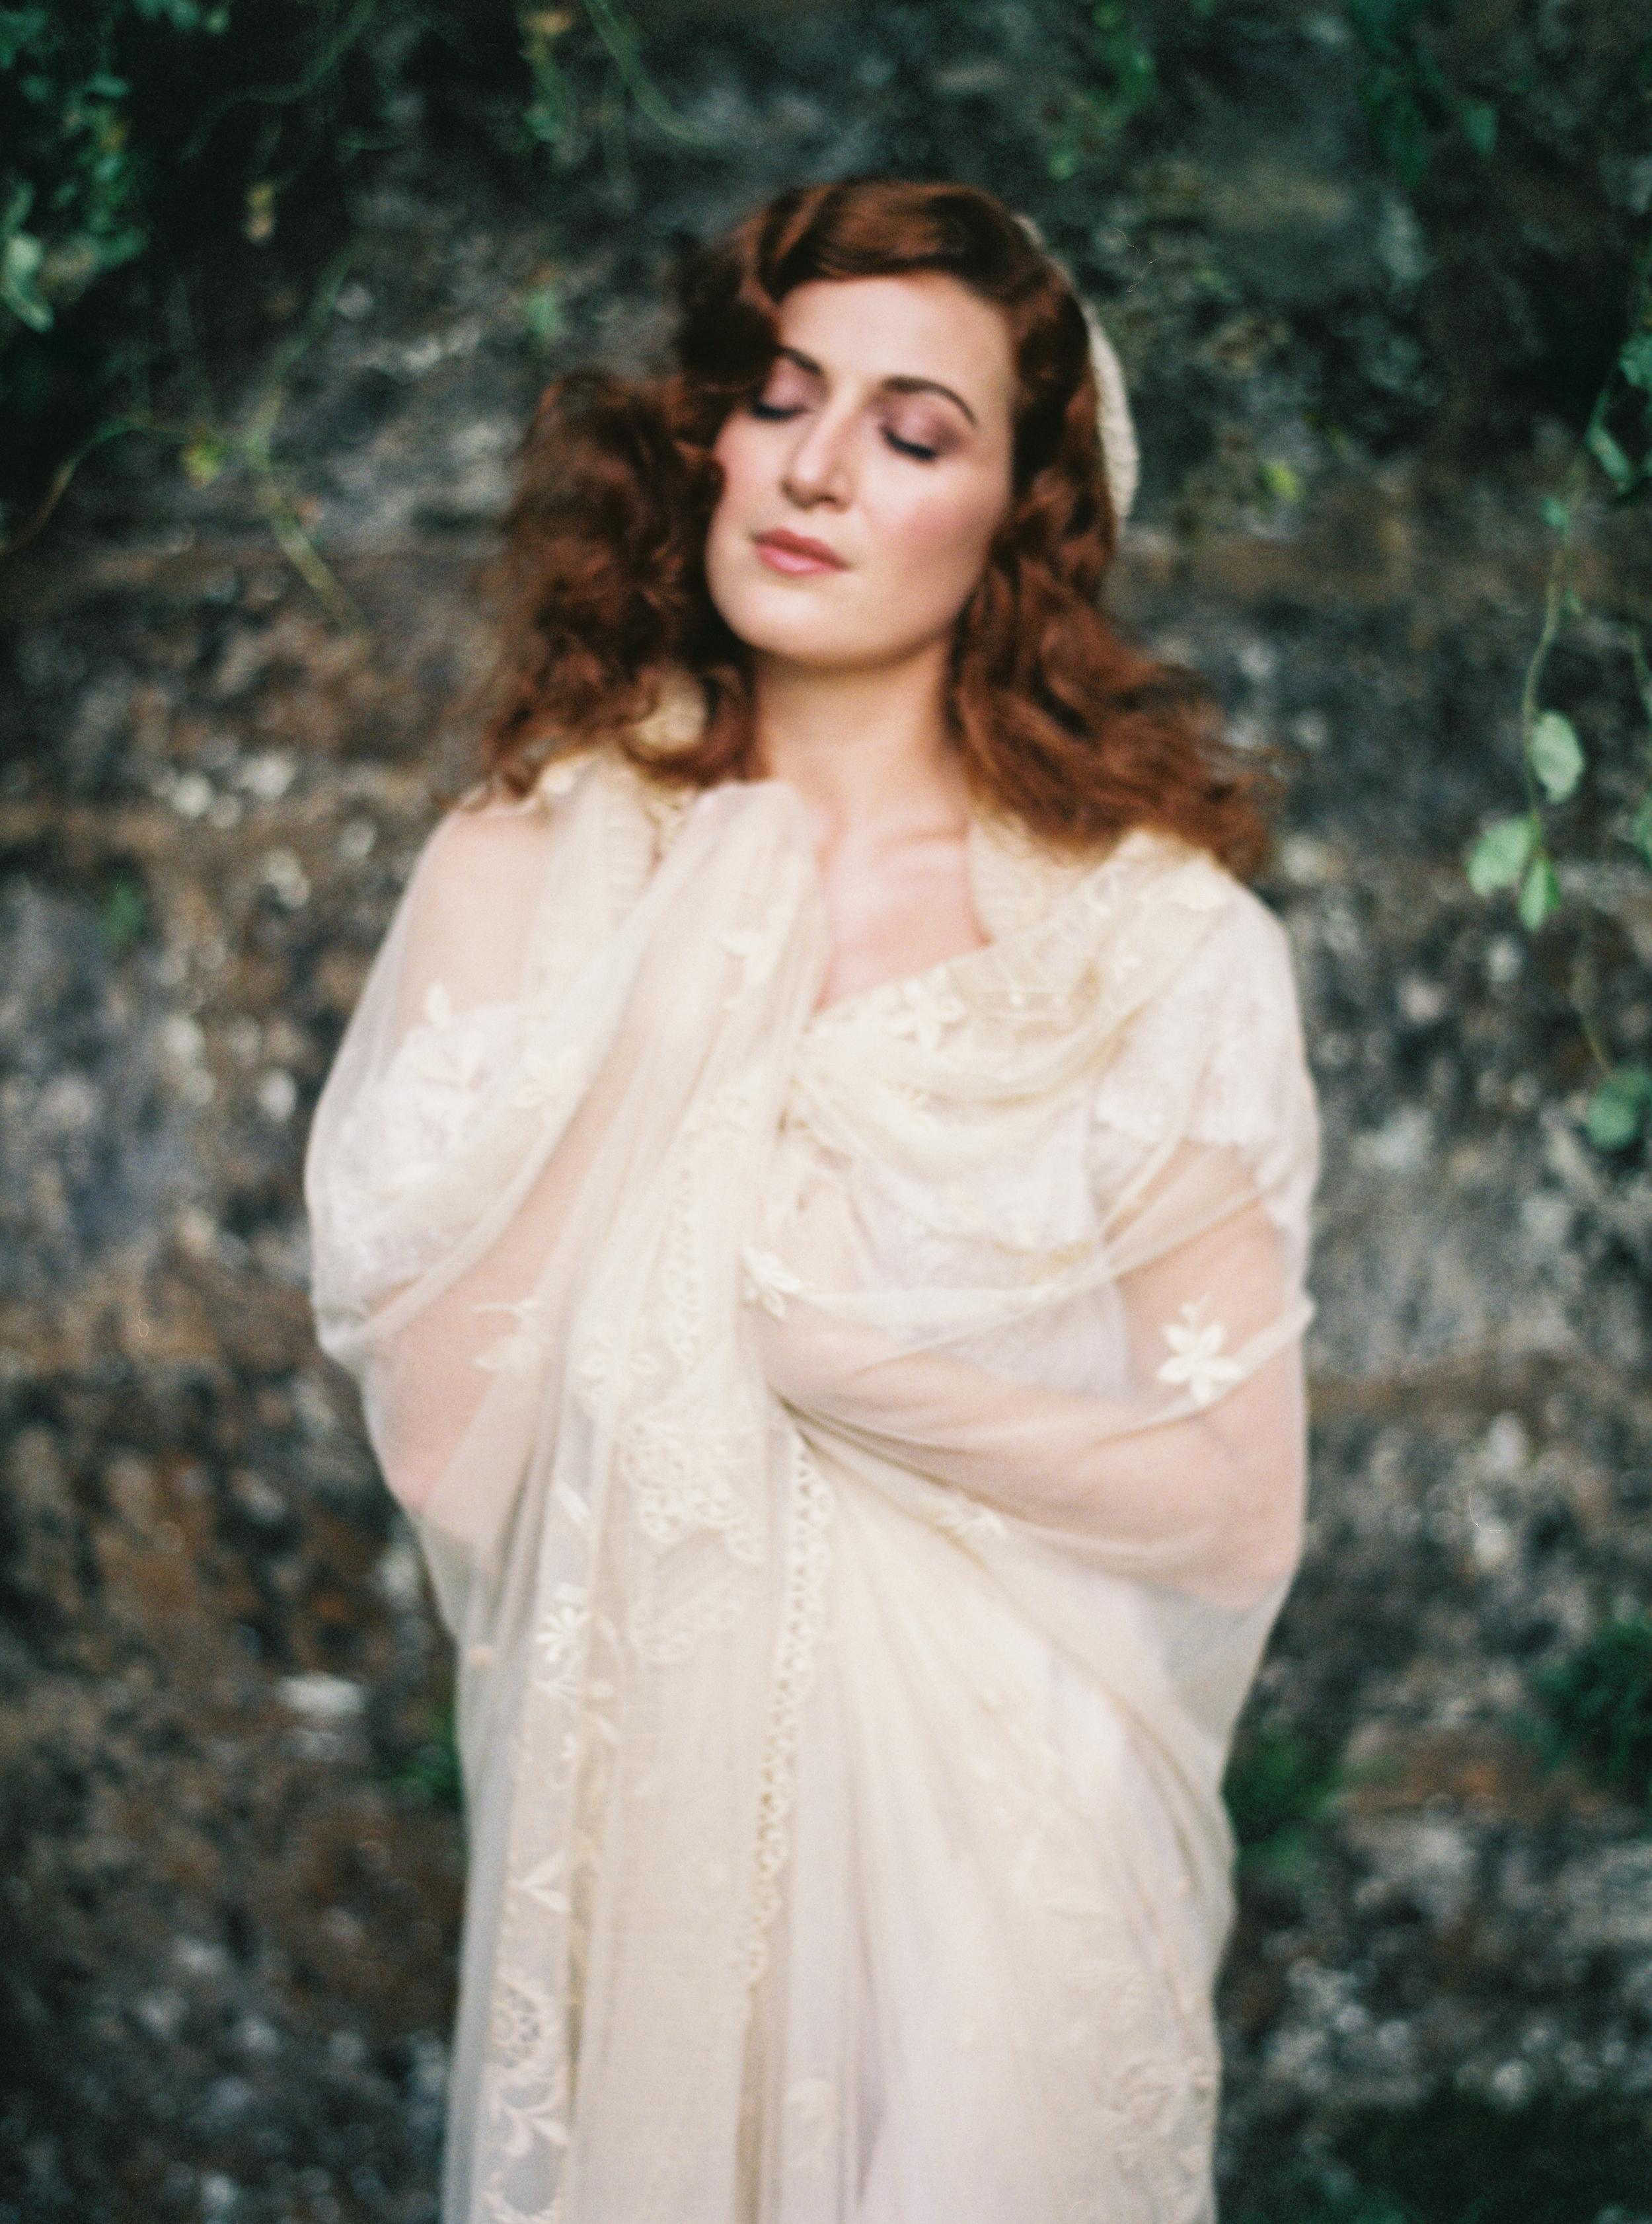 Photo by Tamara Gigola. European Workshop by Ginny Au. Inspirational bridal shoot. Dress by Gossamer Vintage.